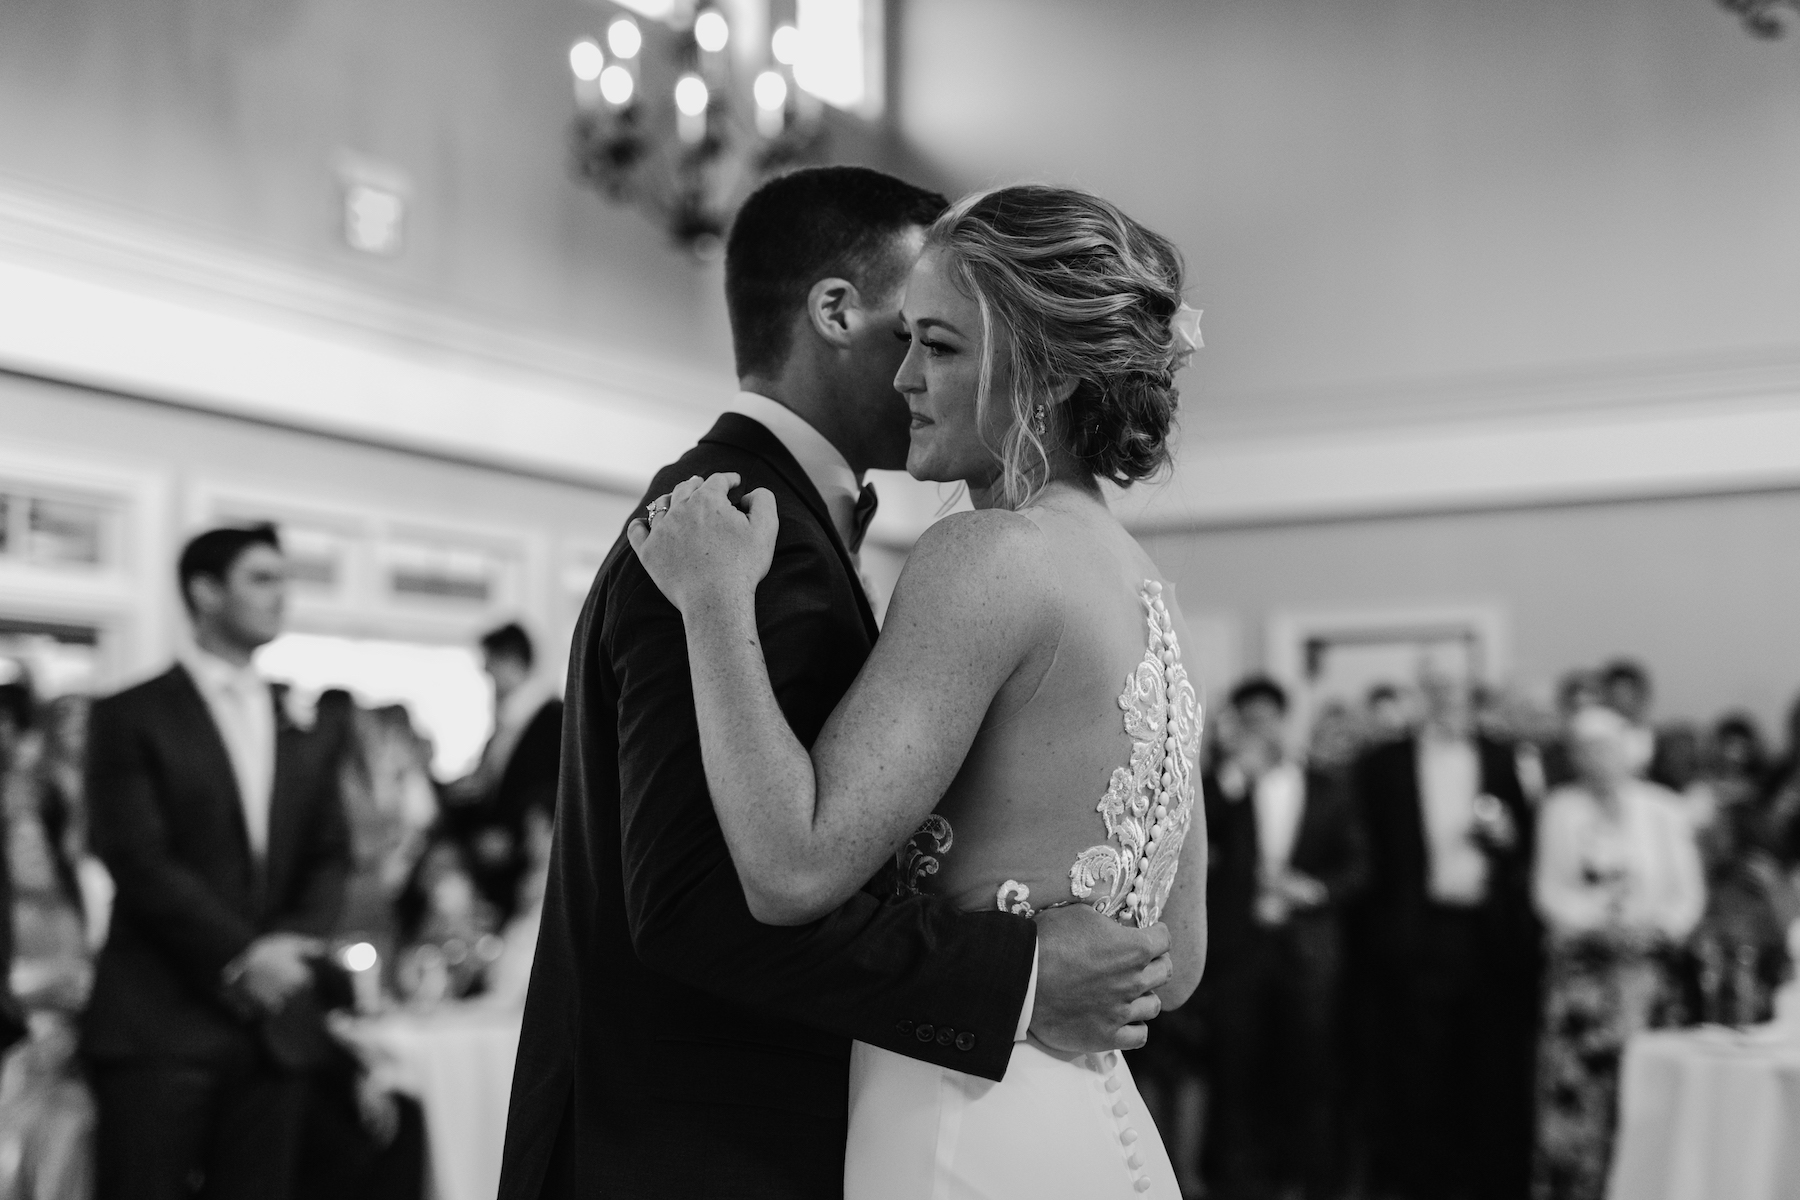 wedding-engagement-photographer-spartanburg-greenville-columbia-carolina-south-north-511.JPG